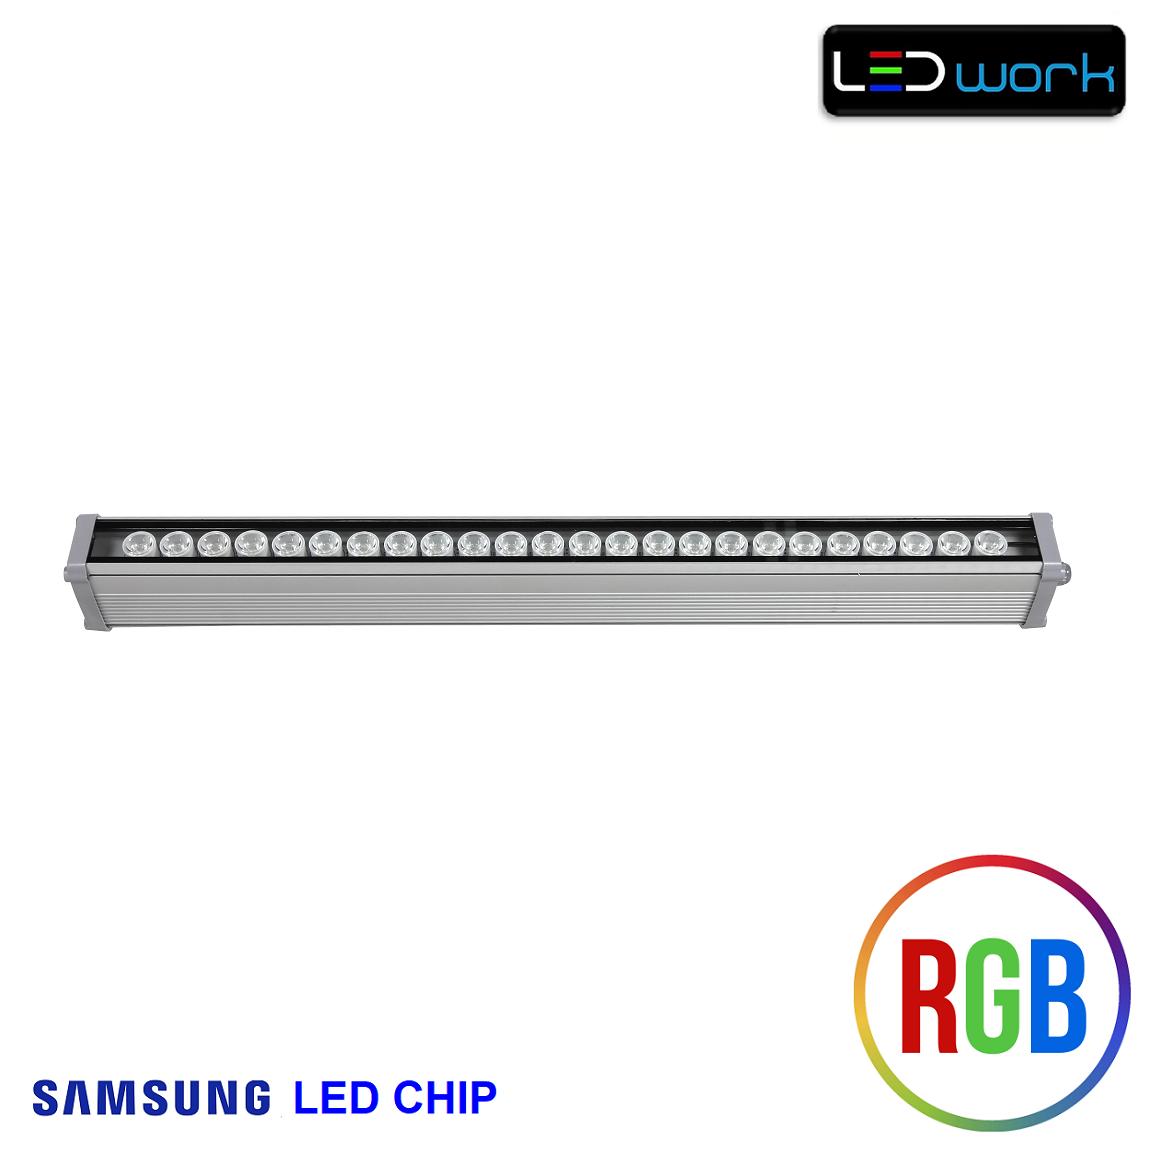 67 cm 24 Watt SAMSUNG LED Chip Sıva Üstü RGB Wallwasher